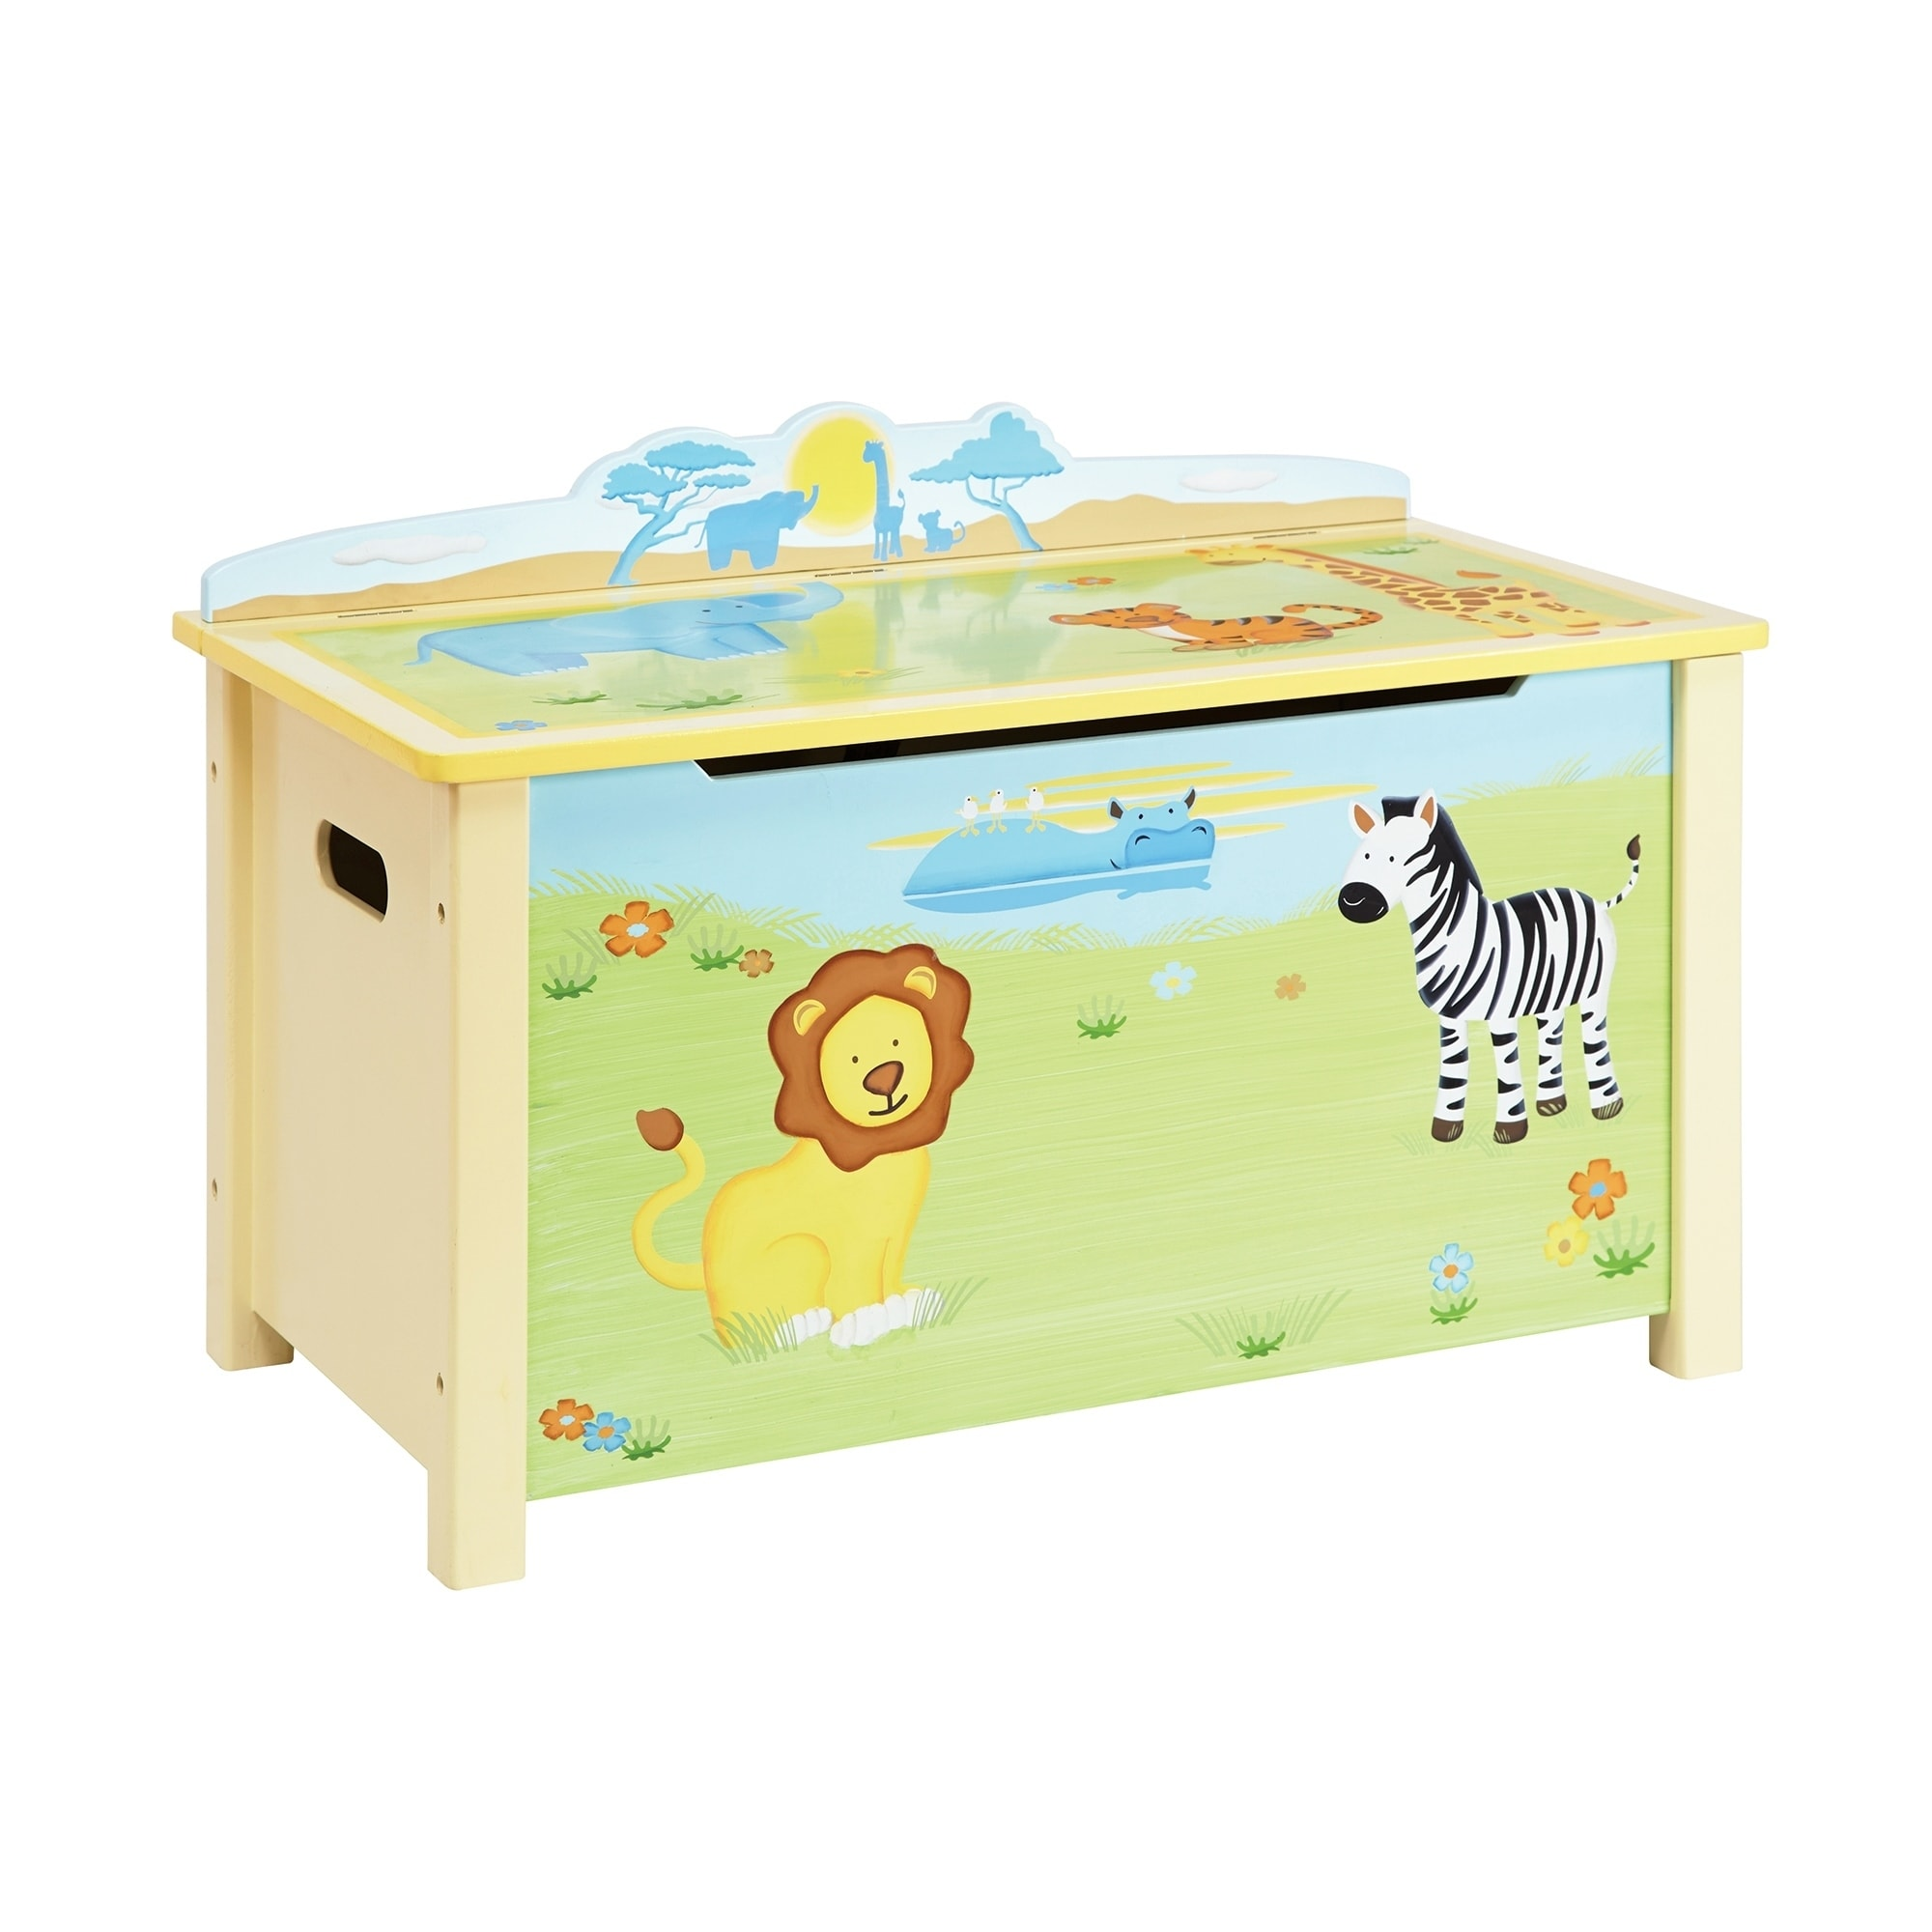 Guidecraft Savanna Smiles Toy Box, Natural